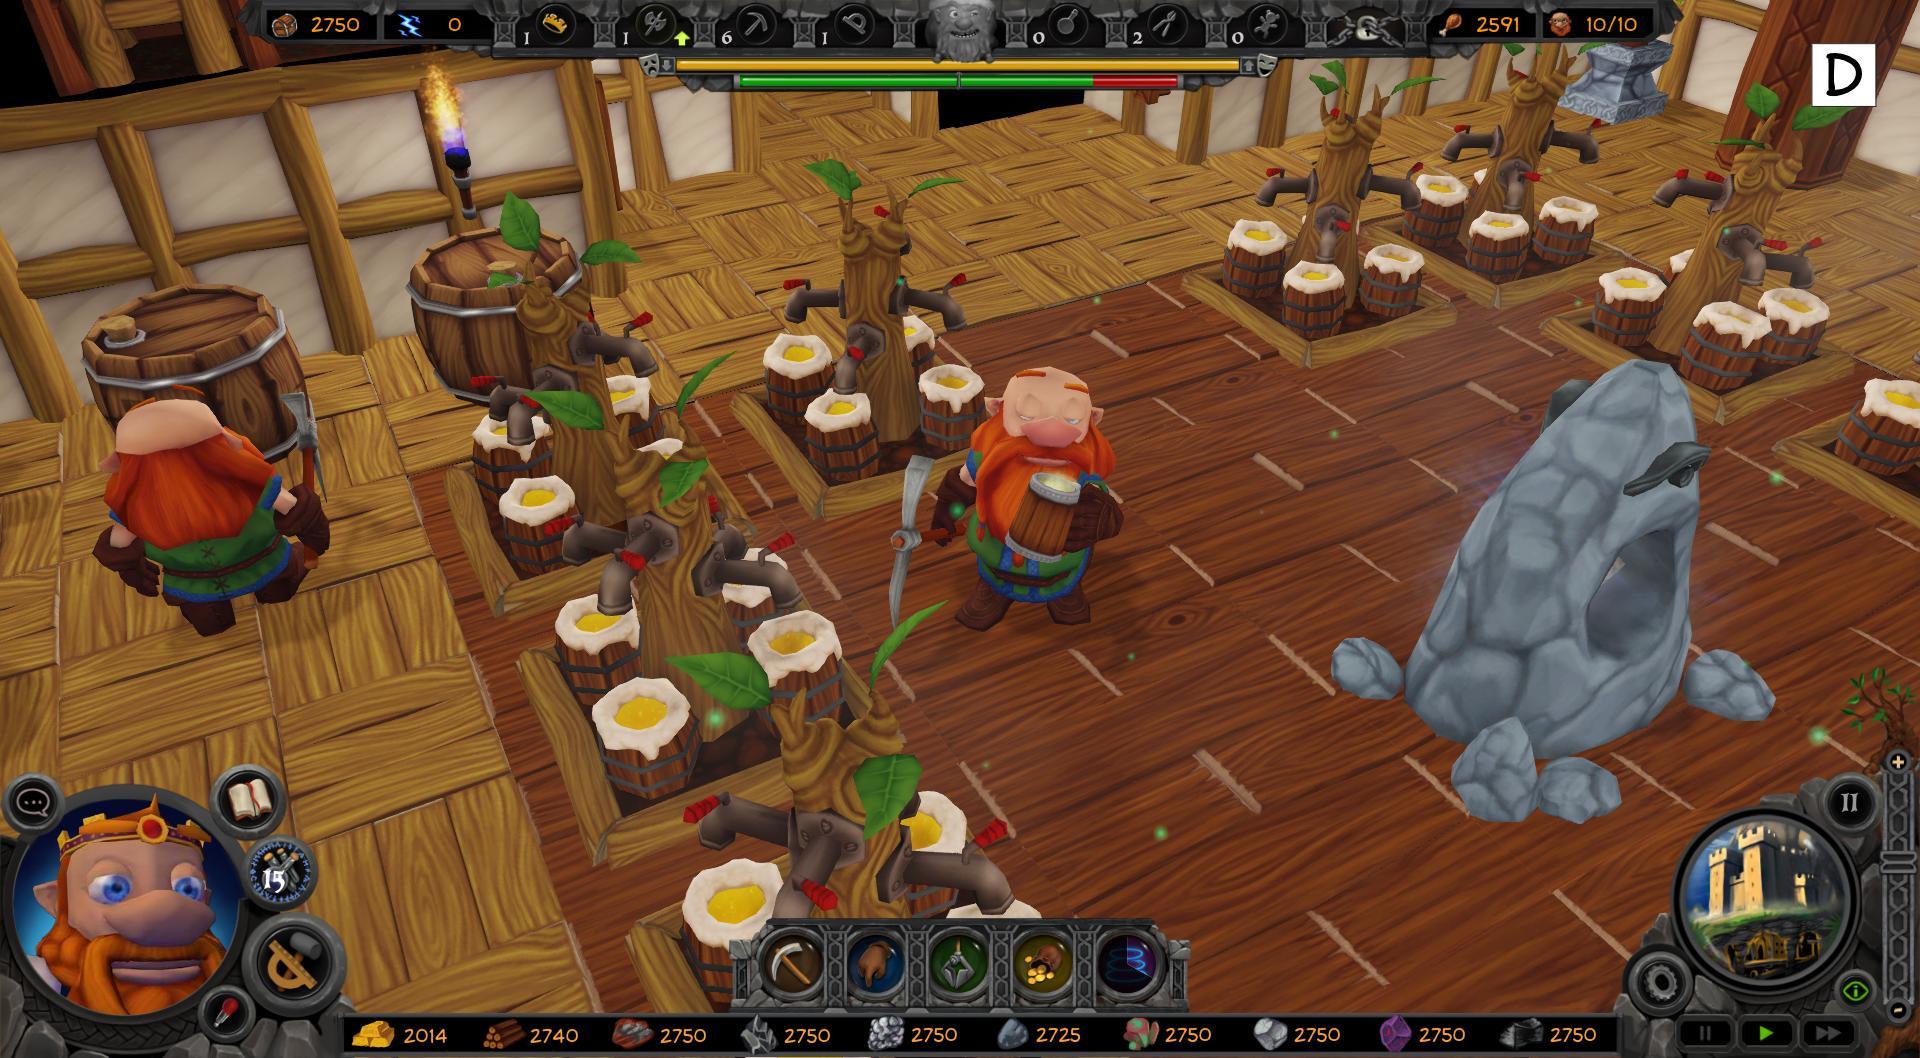 A Game of Dwarves - скриншоты, обои, картинки, концепт-арт, волпейперы